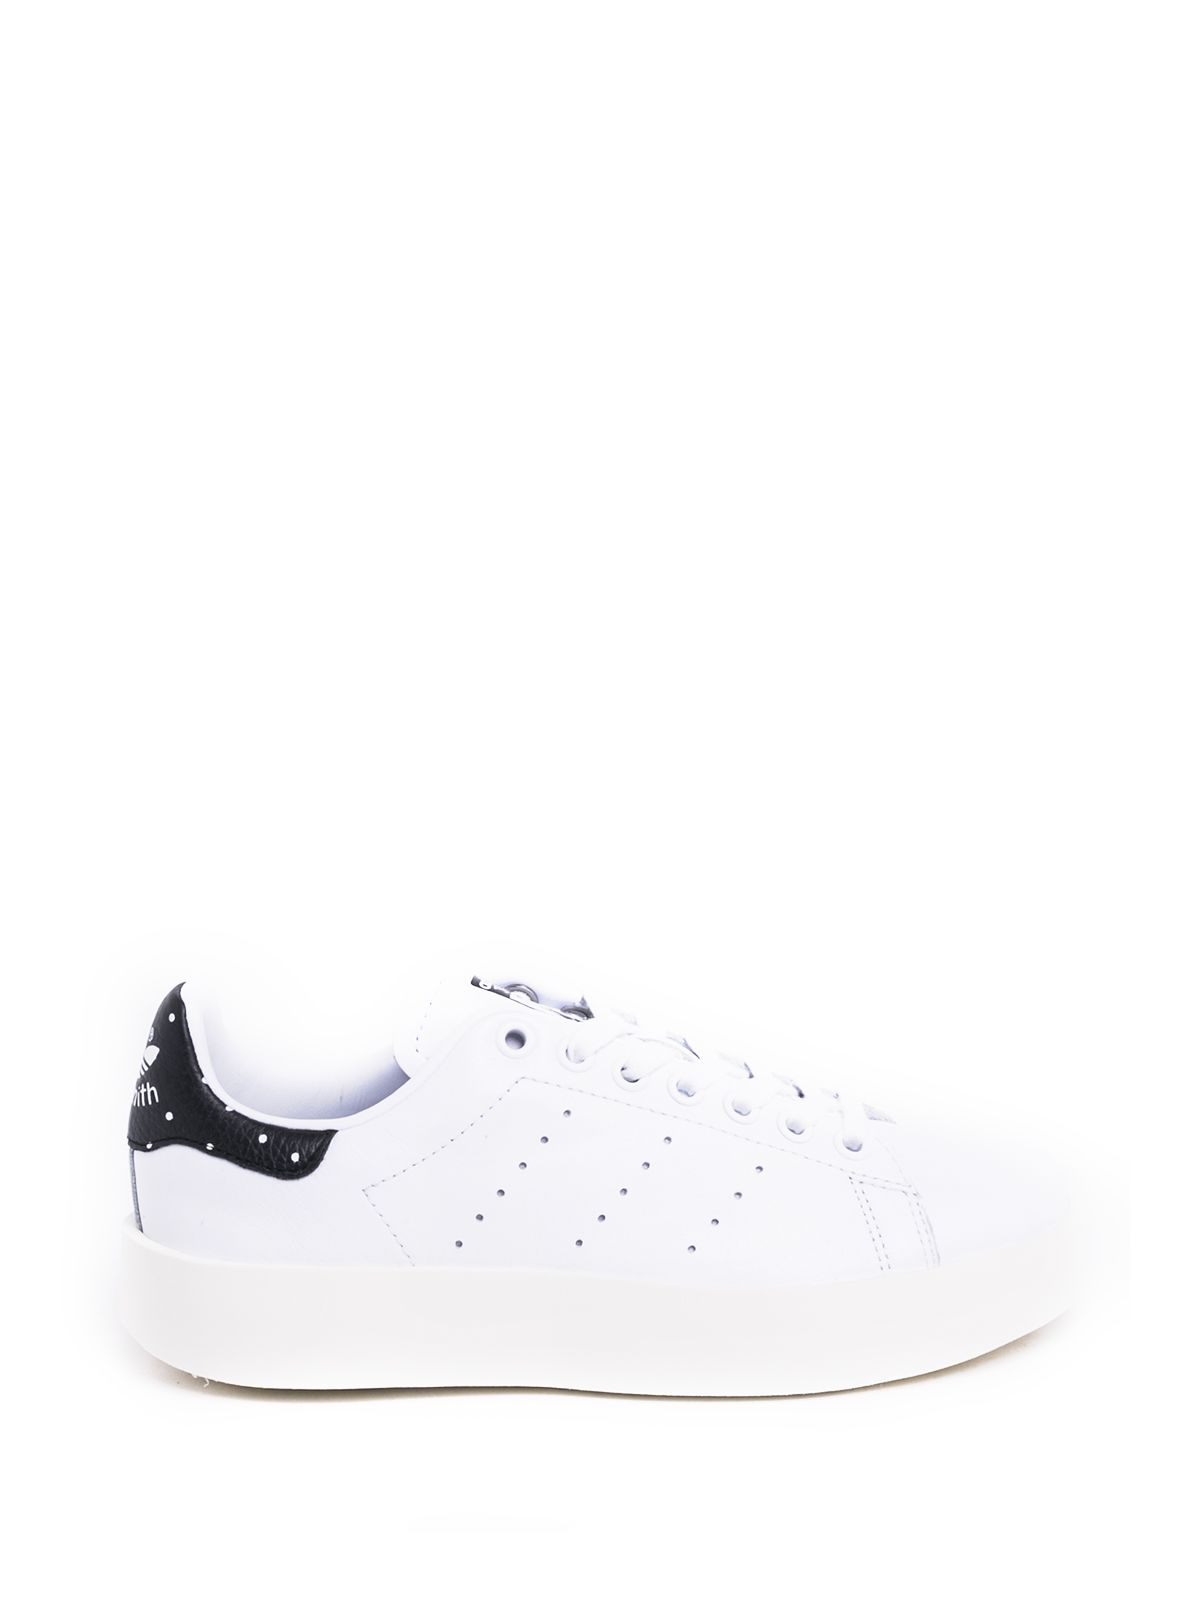 Adidas Originals Stan Smith Bold Sneakers